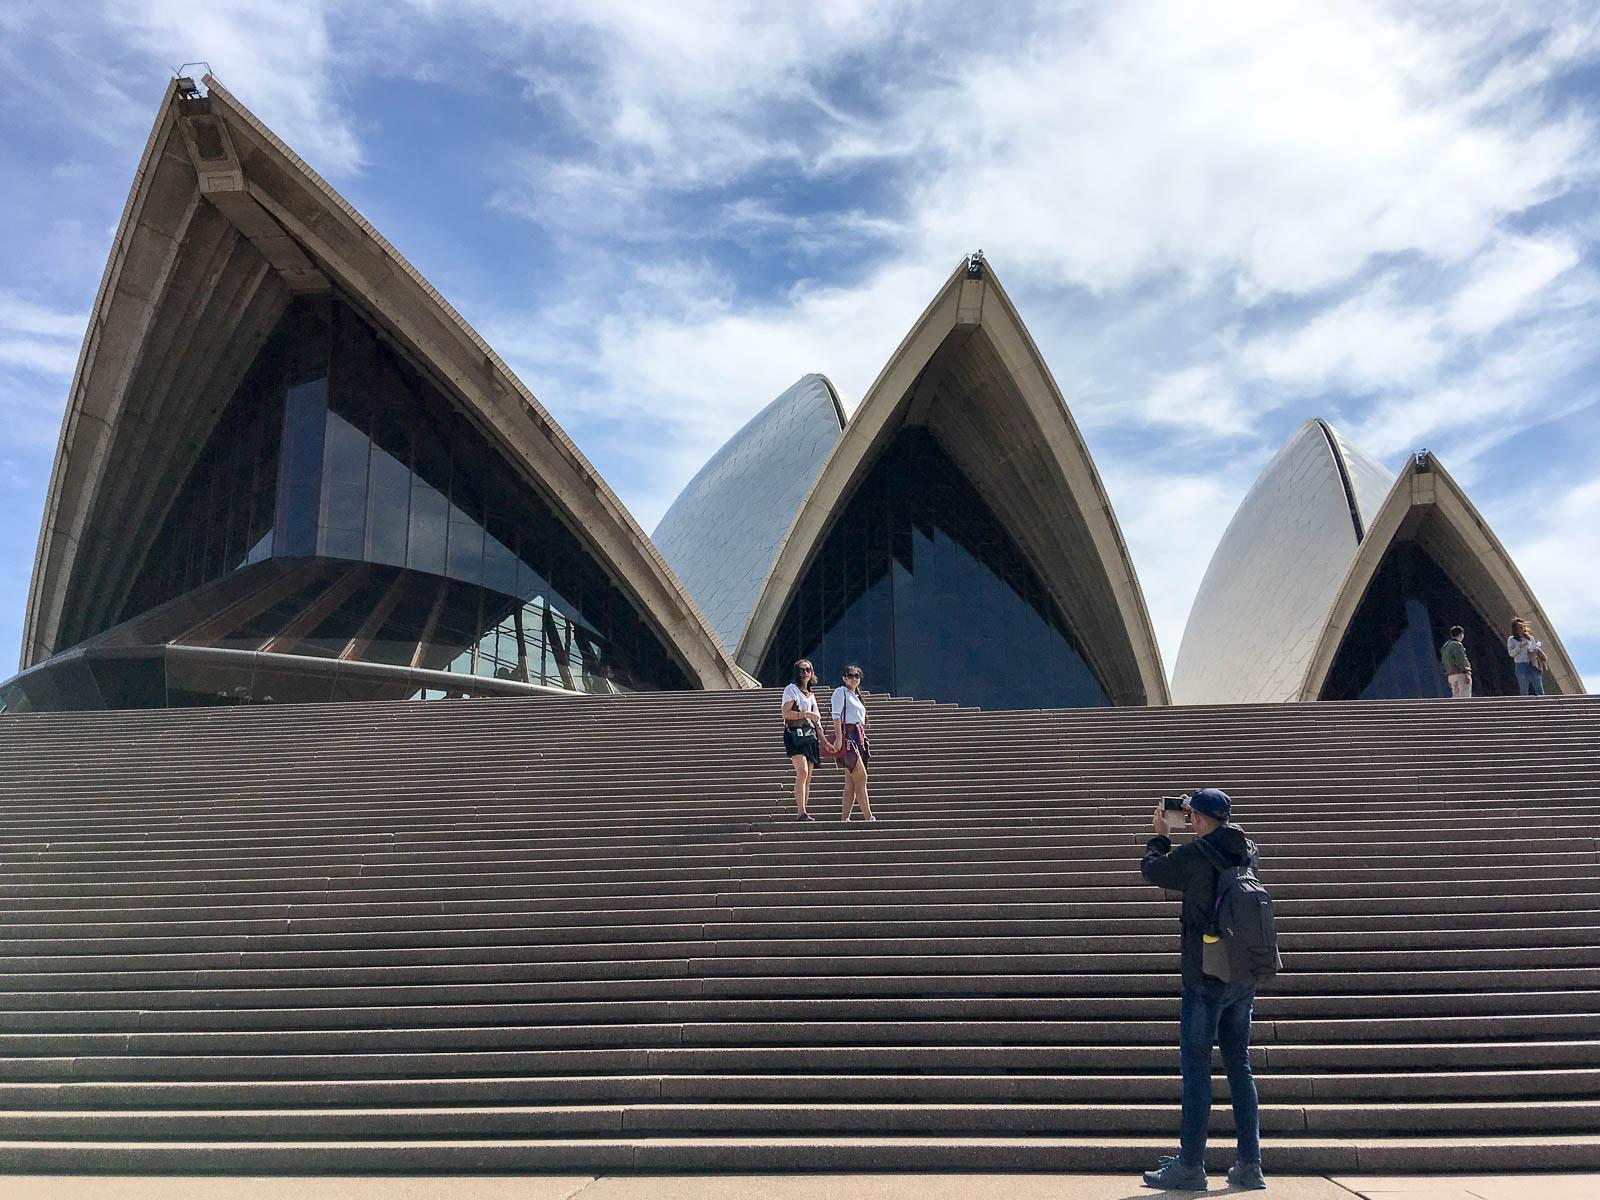 sydney-opera-house-stairs